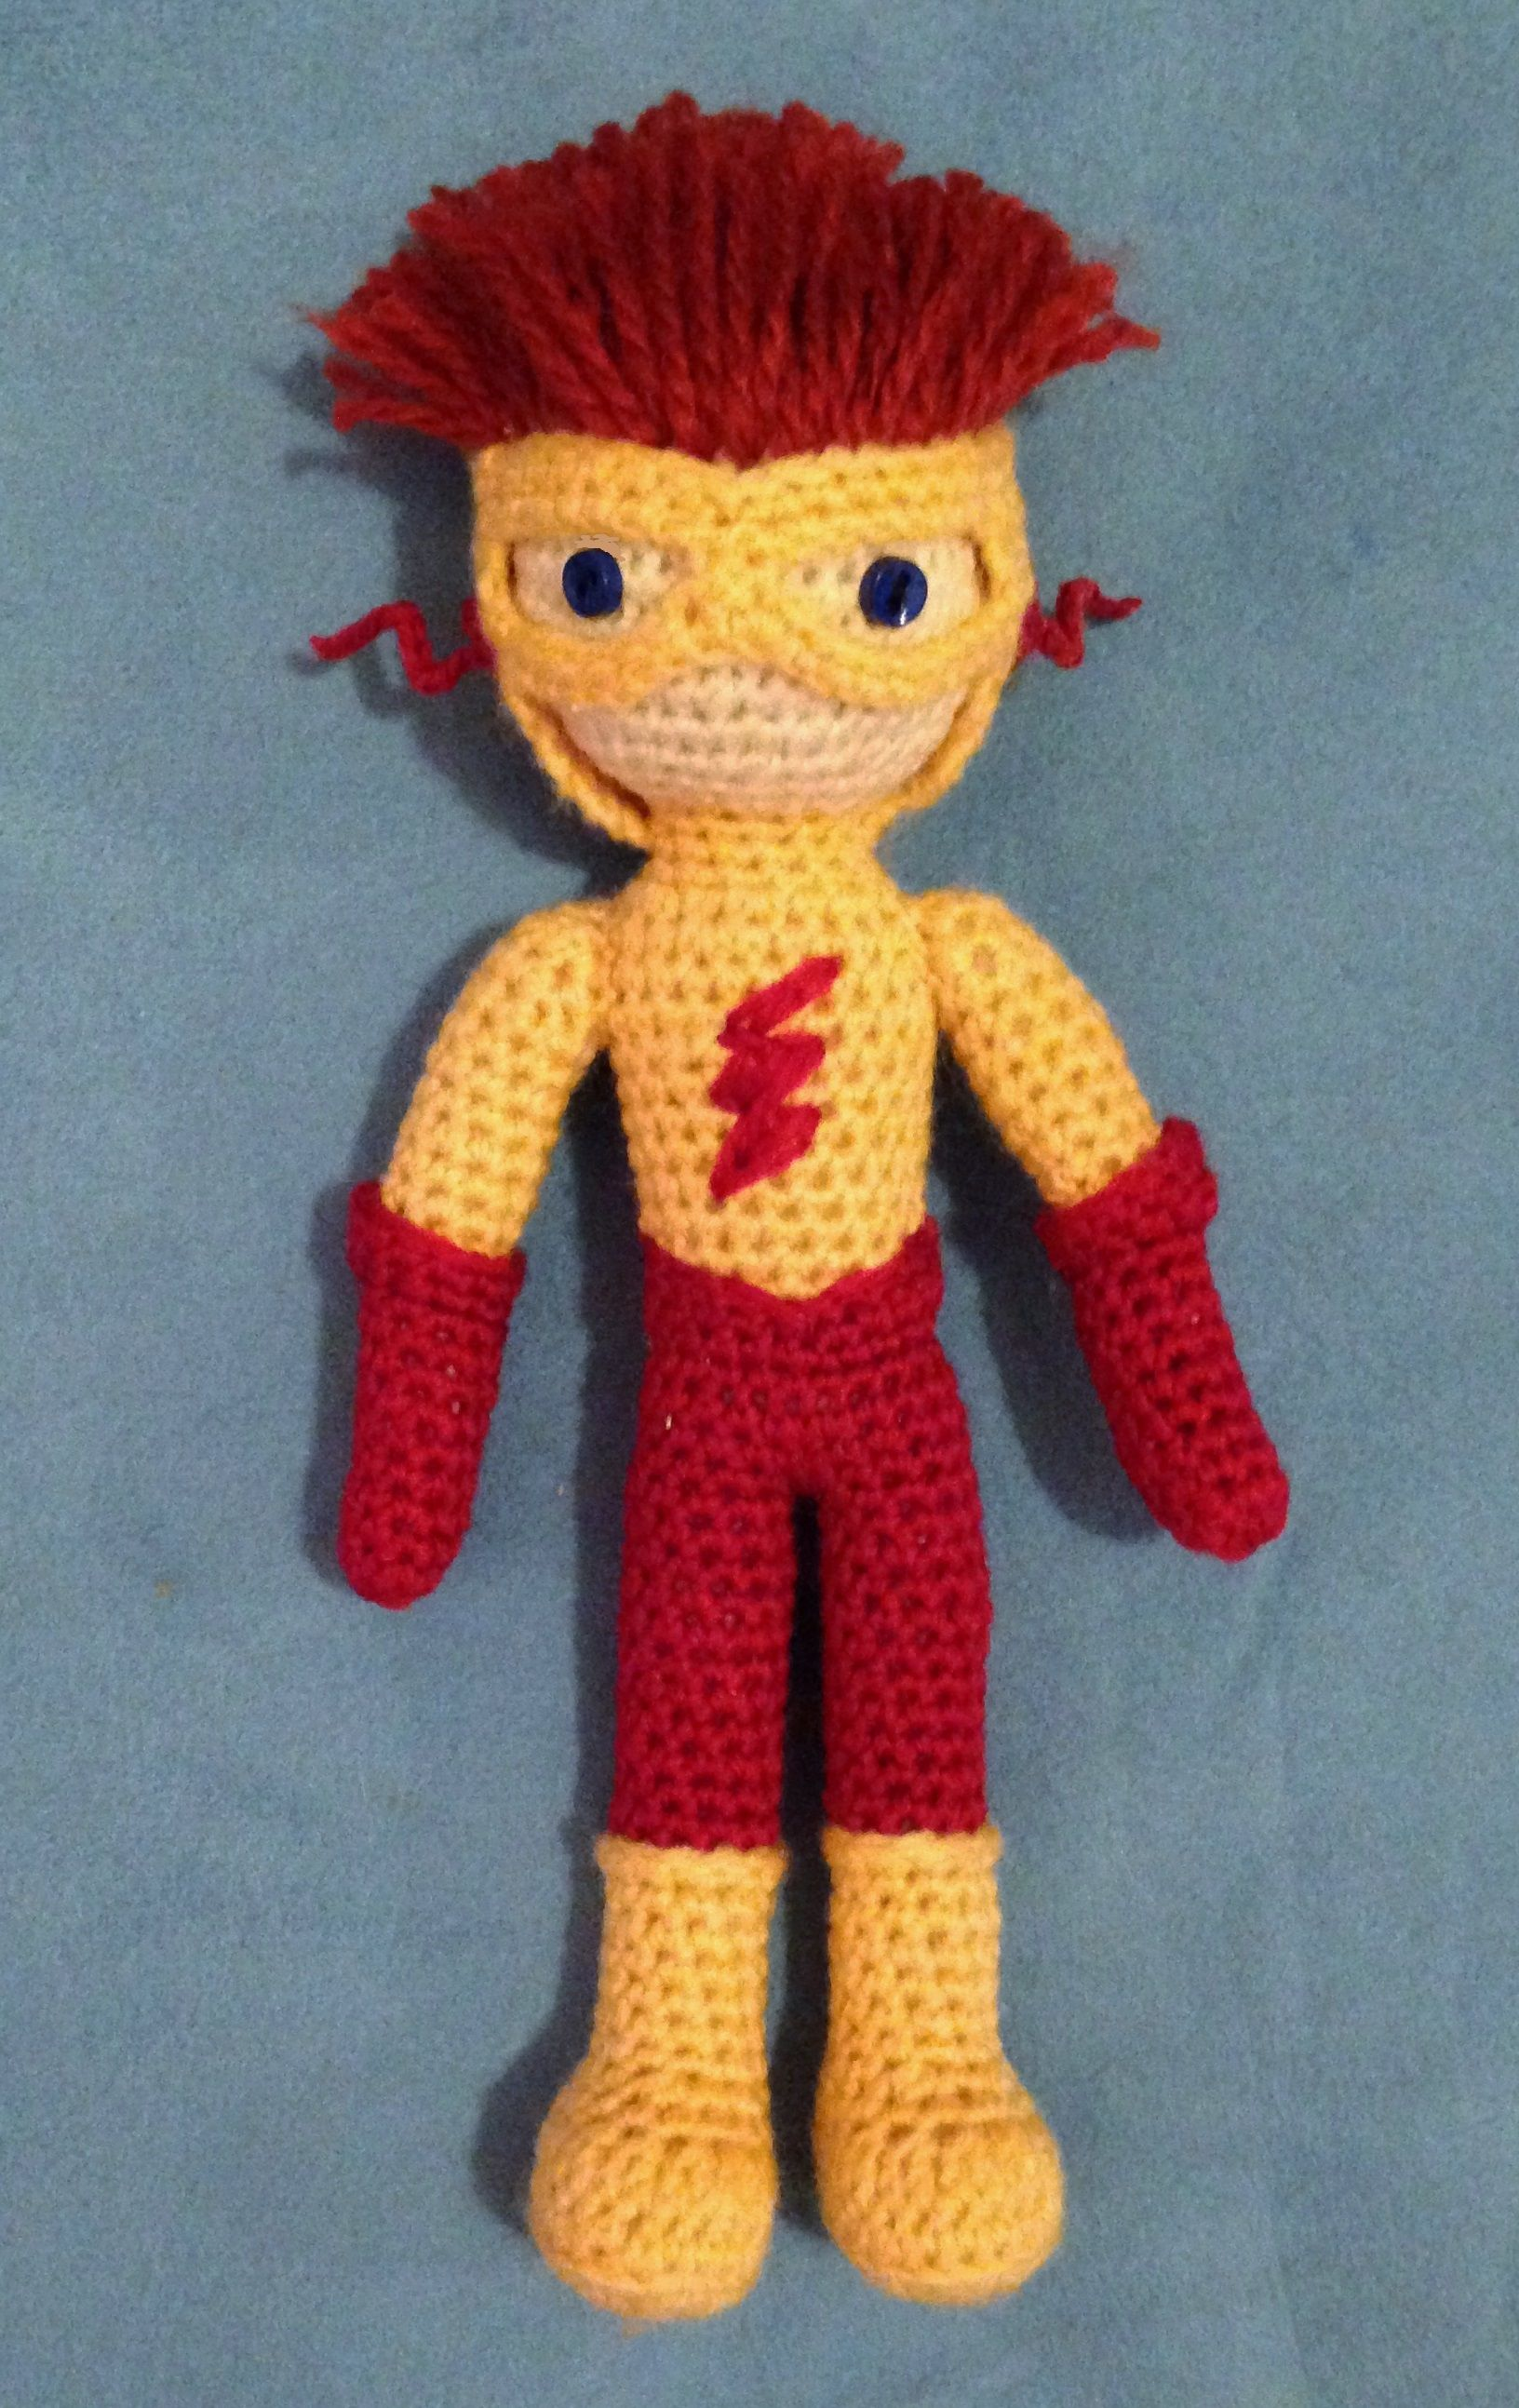 Teen Titans amigurumi - Kid Flash   My Amigurumi   Pinterest